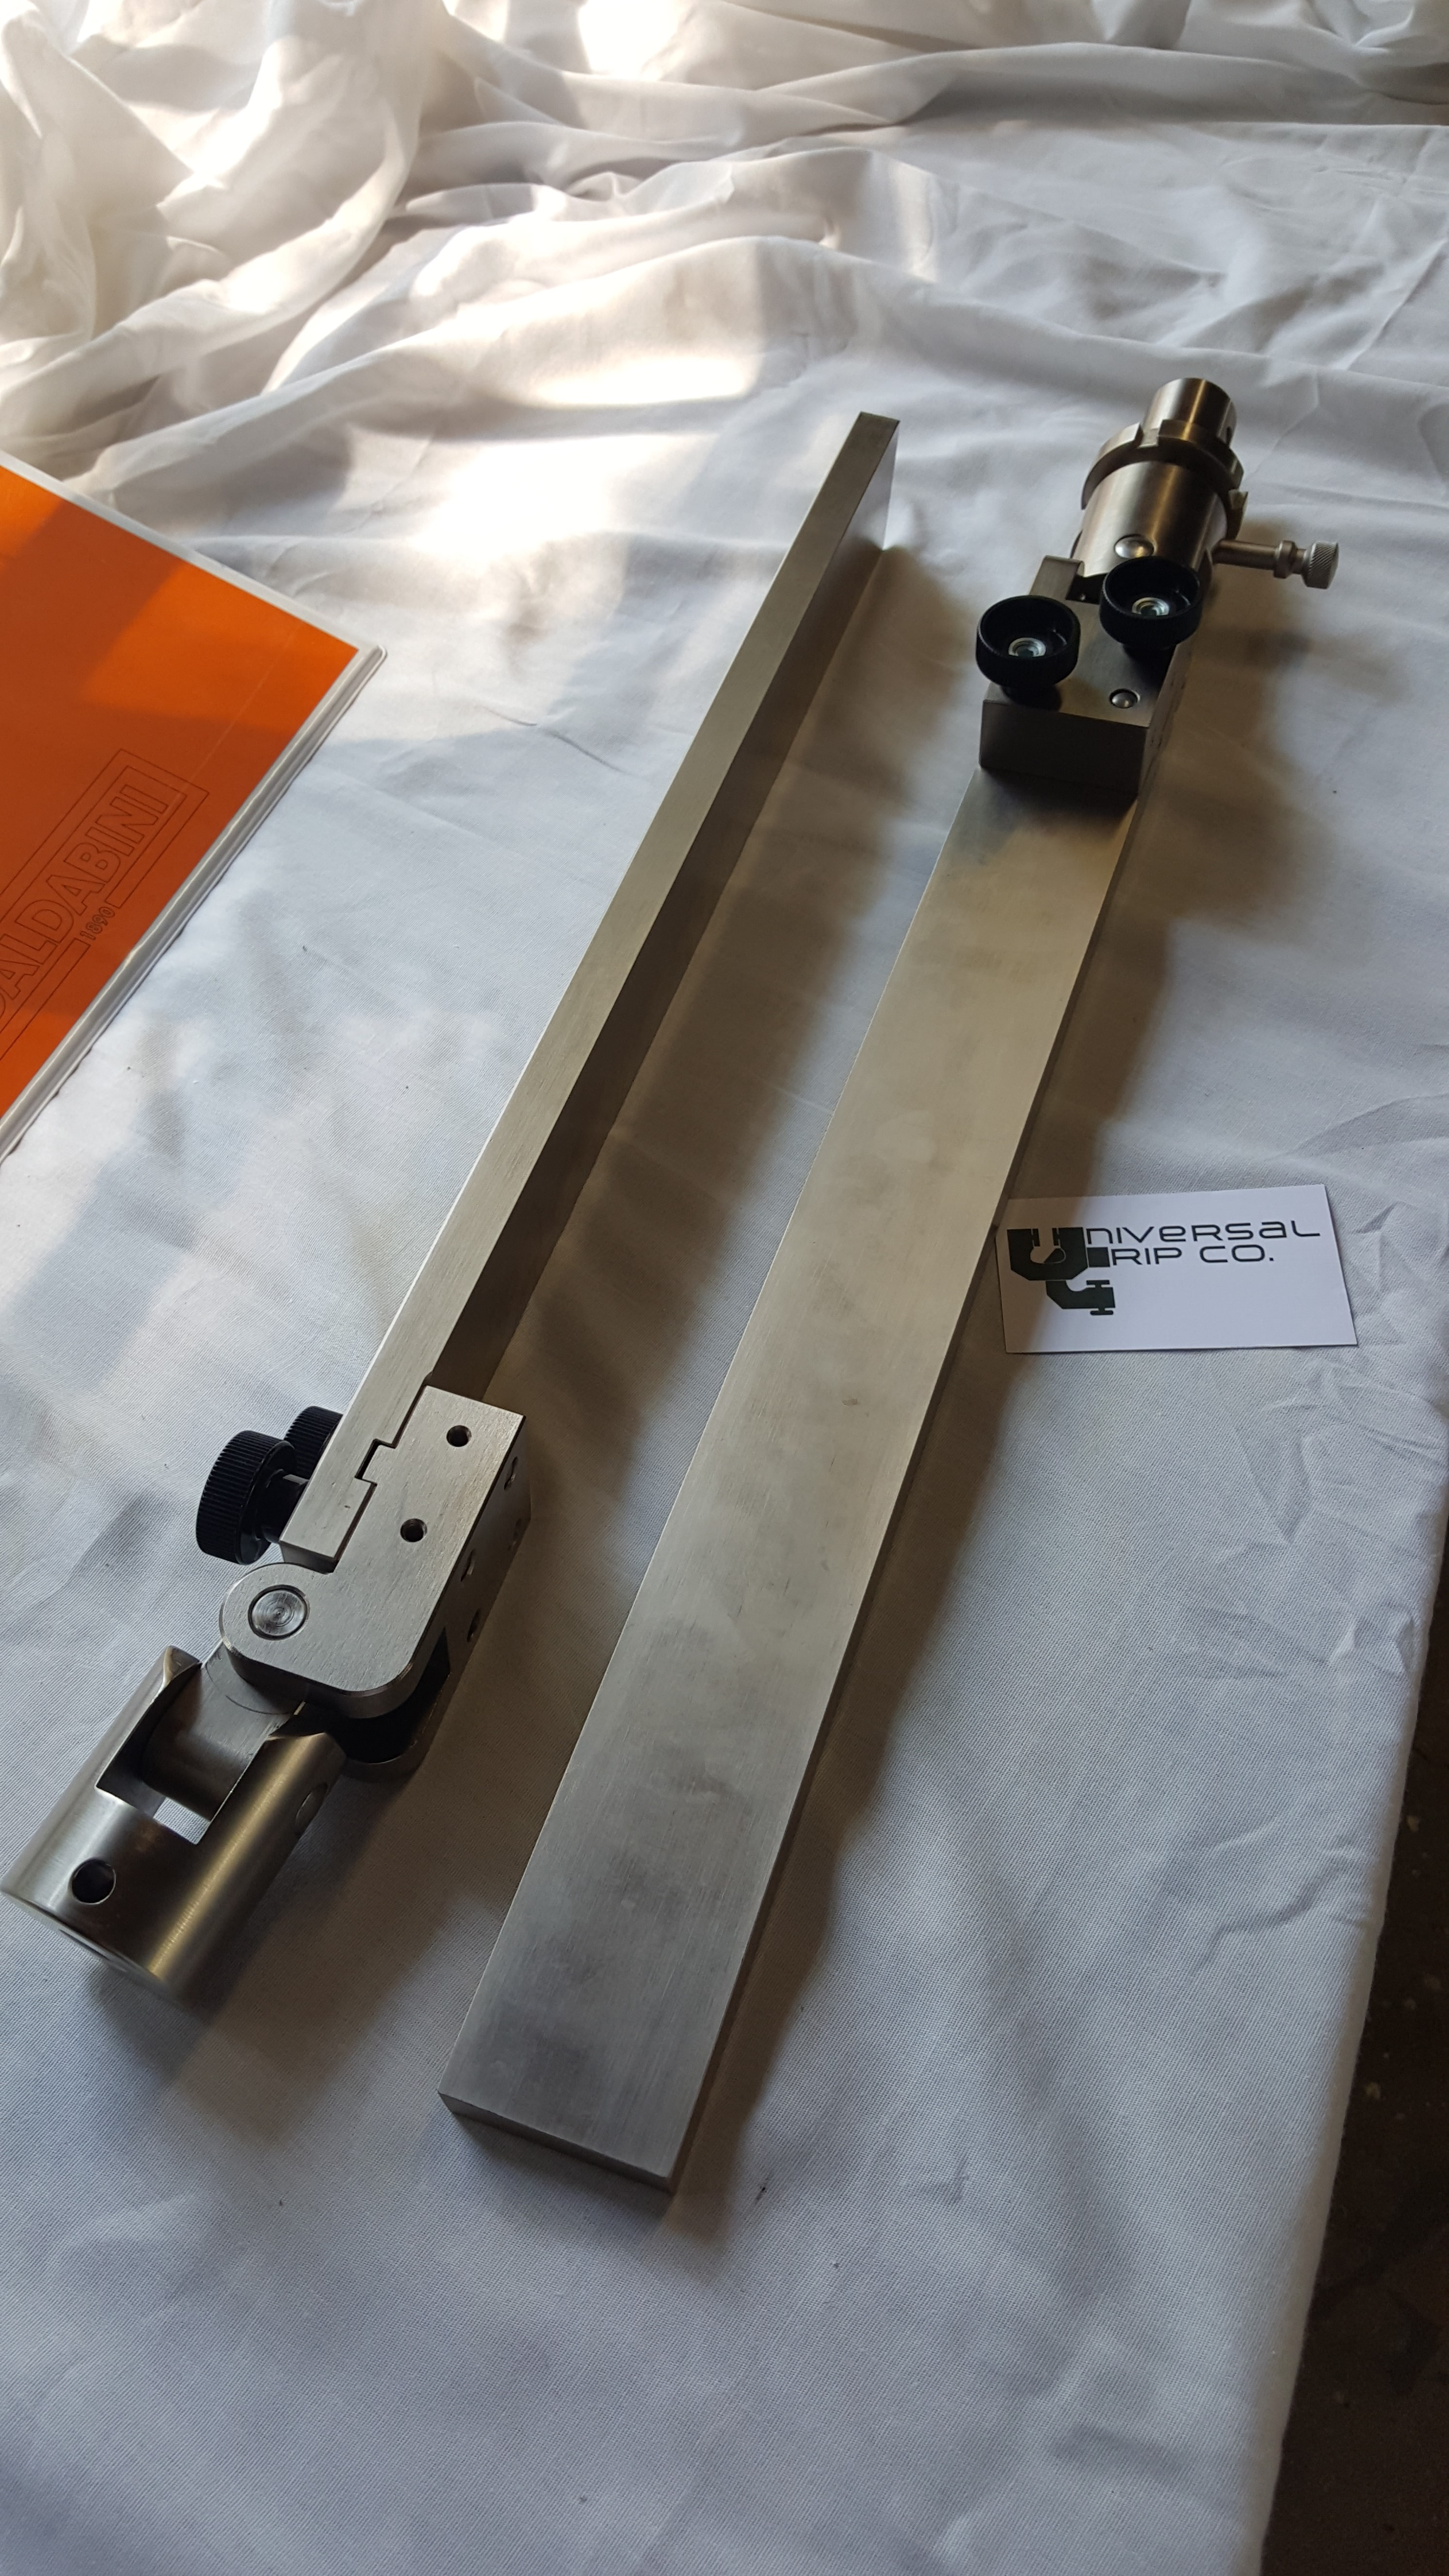 ASTM C273 Shear Fixture (3)